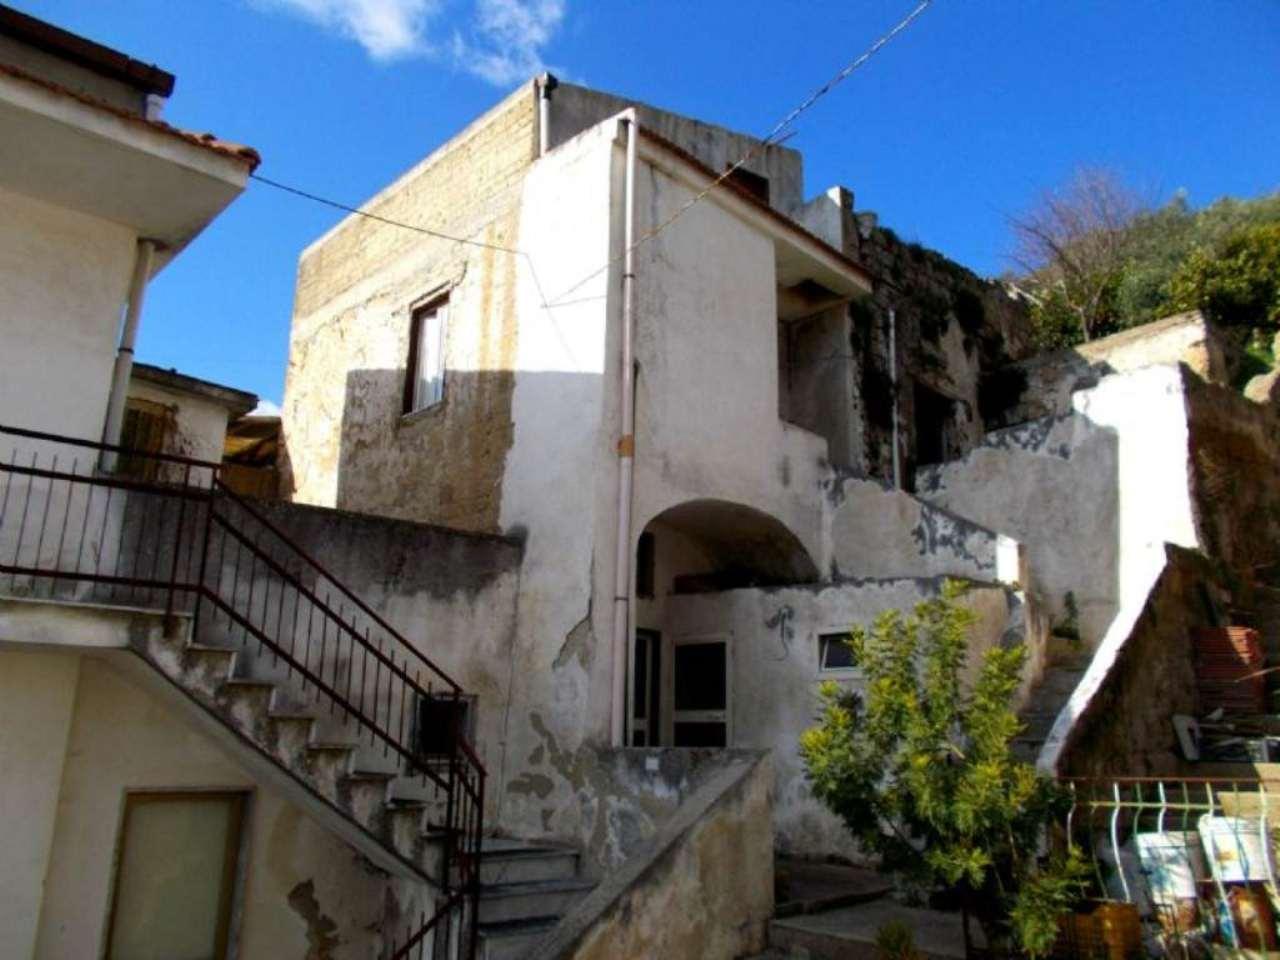 Bilocale Santa Maria a Vico Via Appia Antica 1